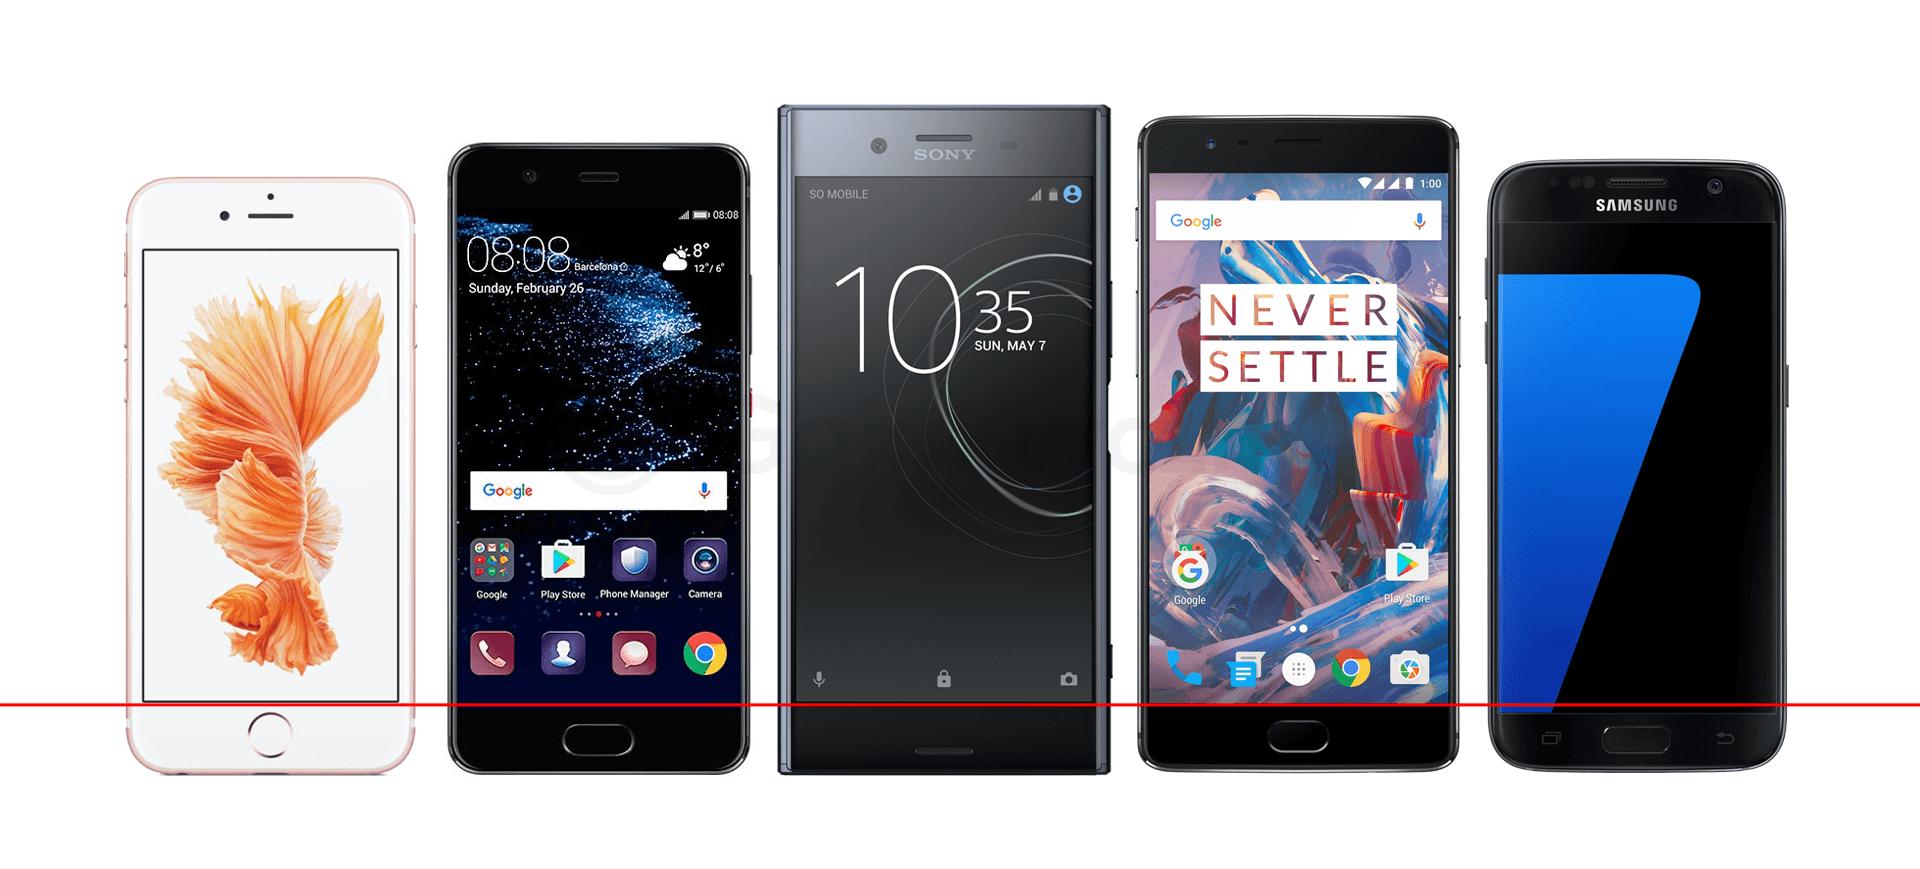 iphone-6s-p10-xperia-xz-premium-oneplus-3t-galaxy-s7-ramki